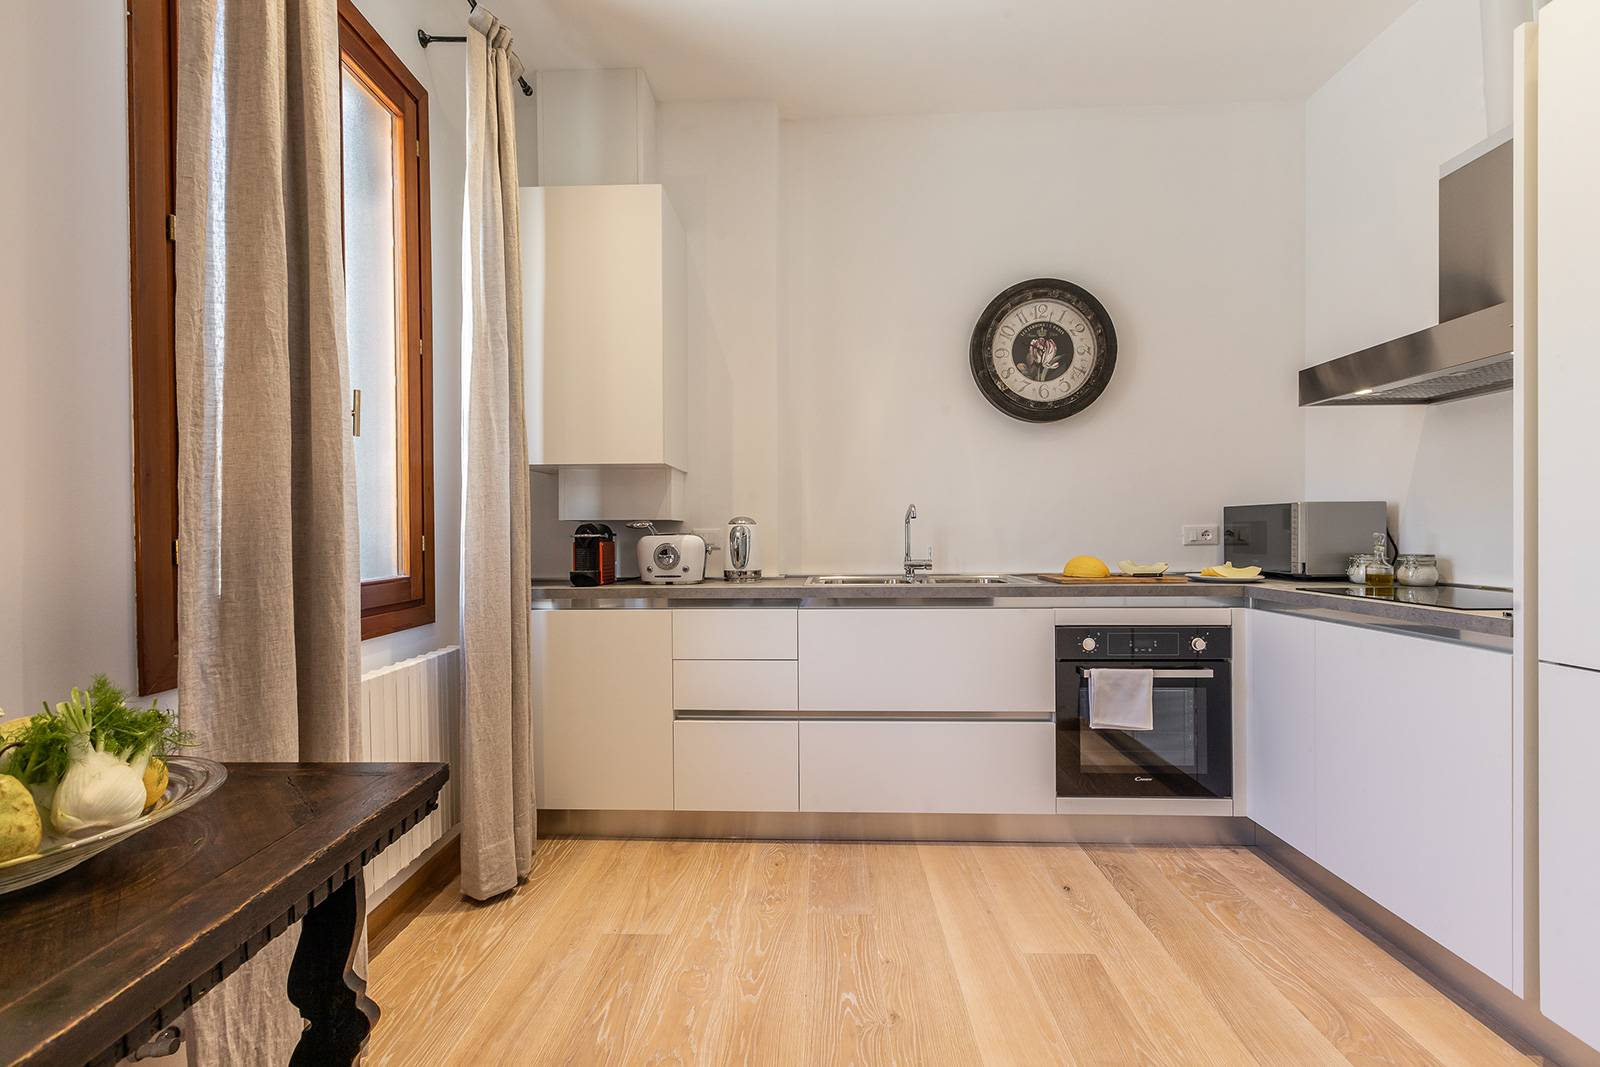 Rigoletto apartment secondary kitchen